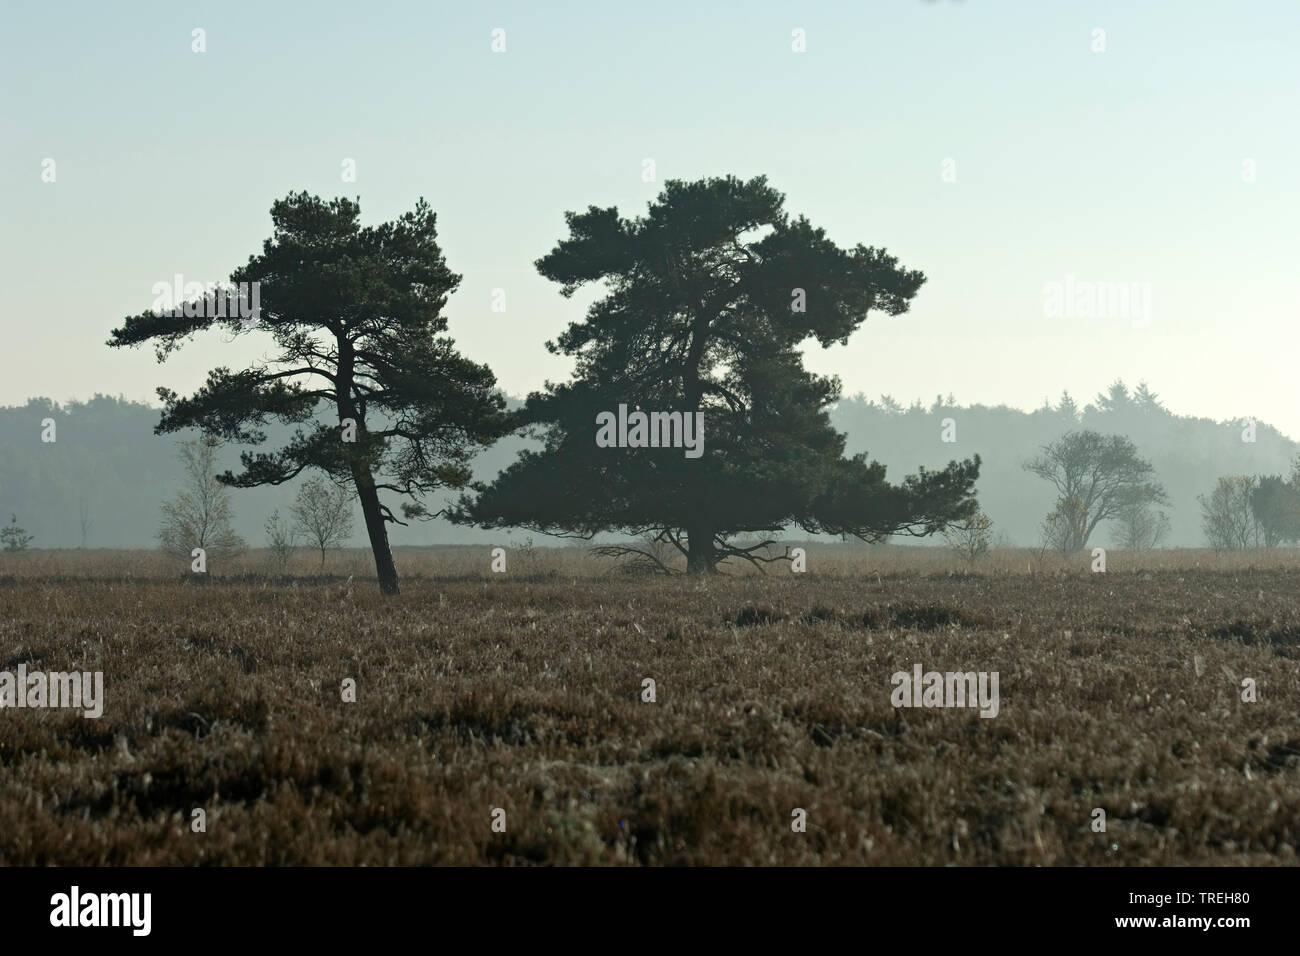 Heidelandschaft im Nationalpark Dwingelderveld im Herbst, Niederlande, Drente, Dwingelderveld Nationalpark | heathland at the Dwingelderveld National - Stock Image